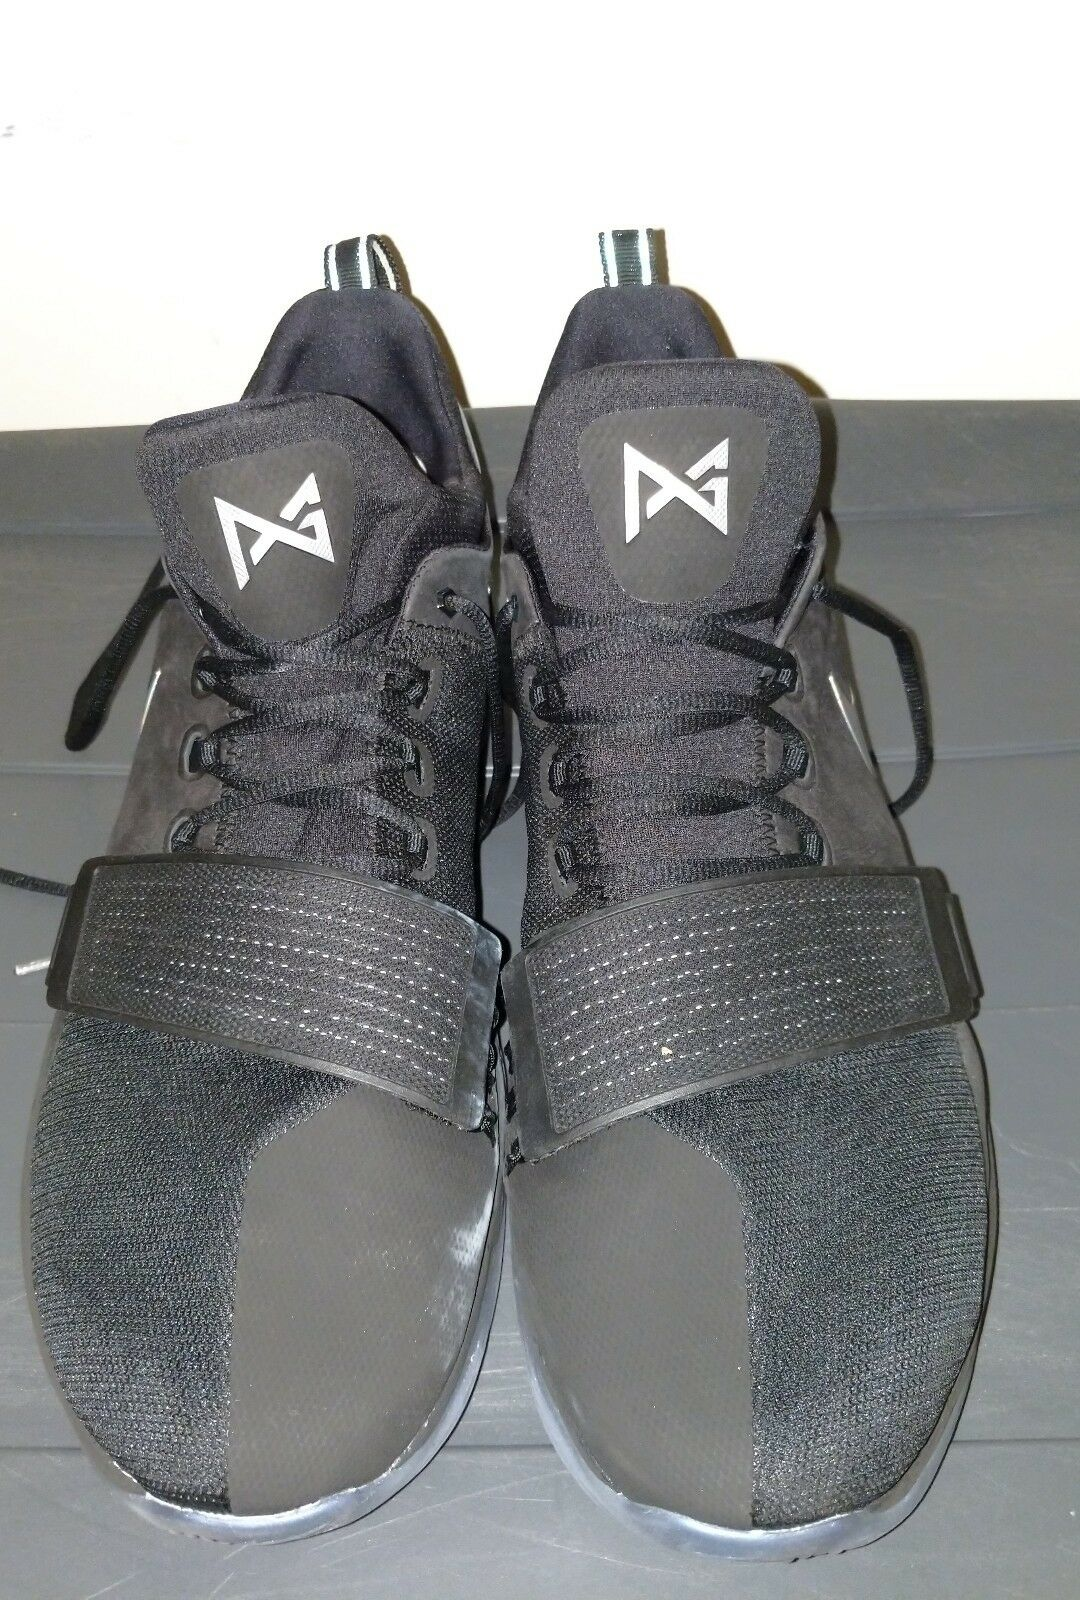 Nike PG 1 TS Prototype SZ George. 17. Pre-Heat Shining Paul George. SZ Receipt. 911082-099 904e6e